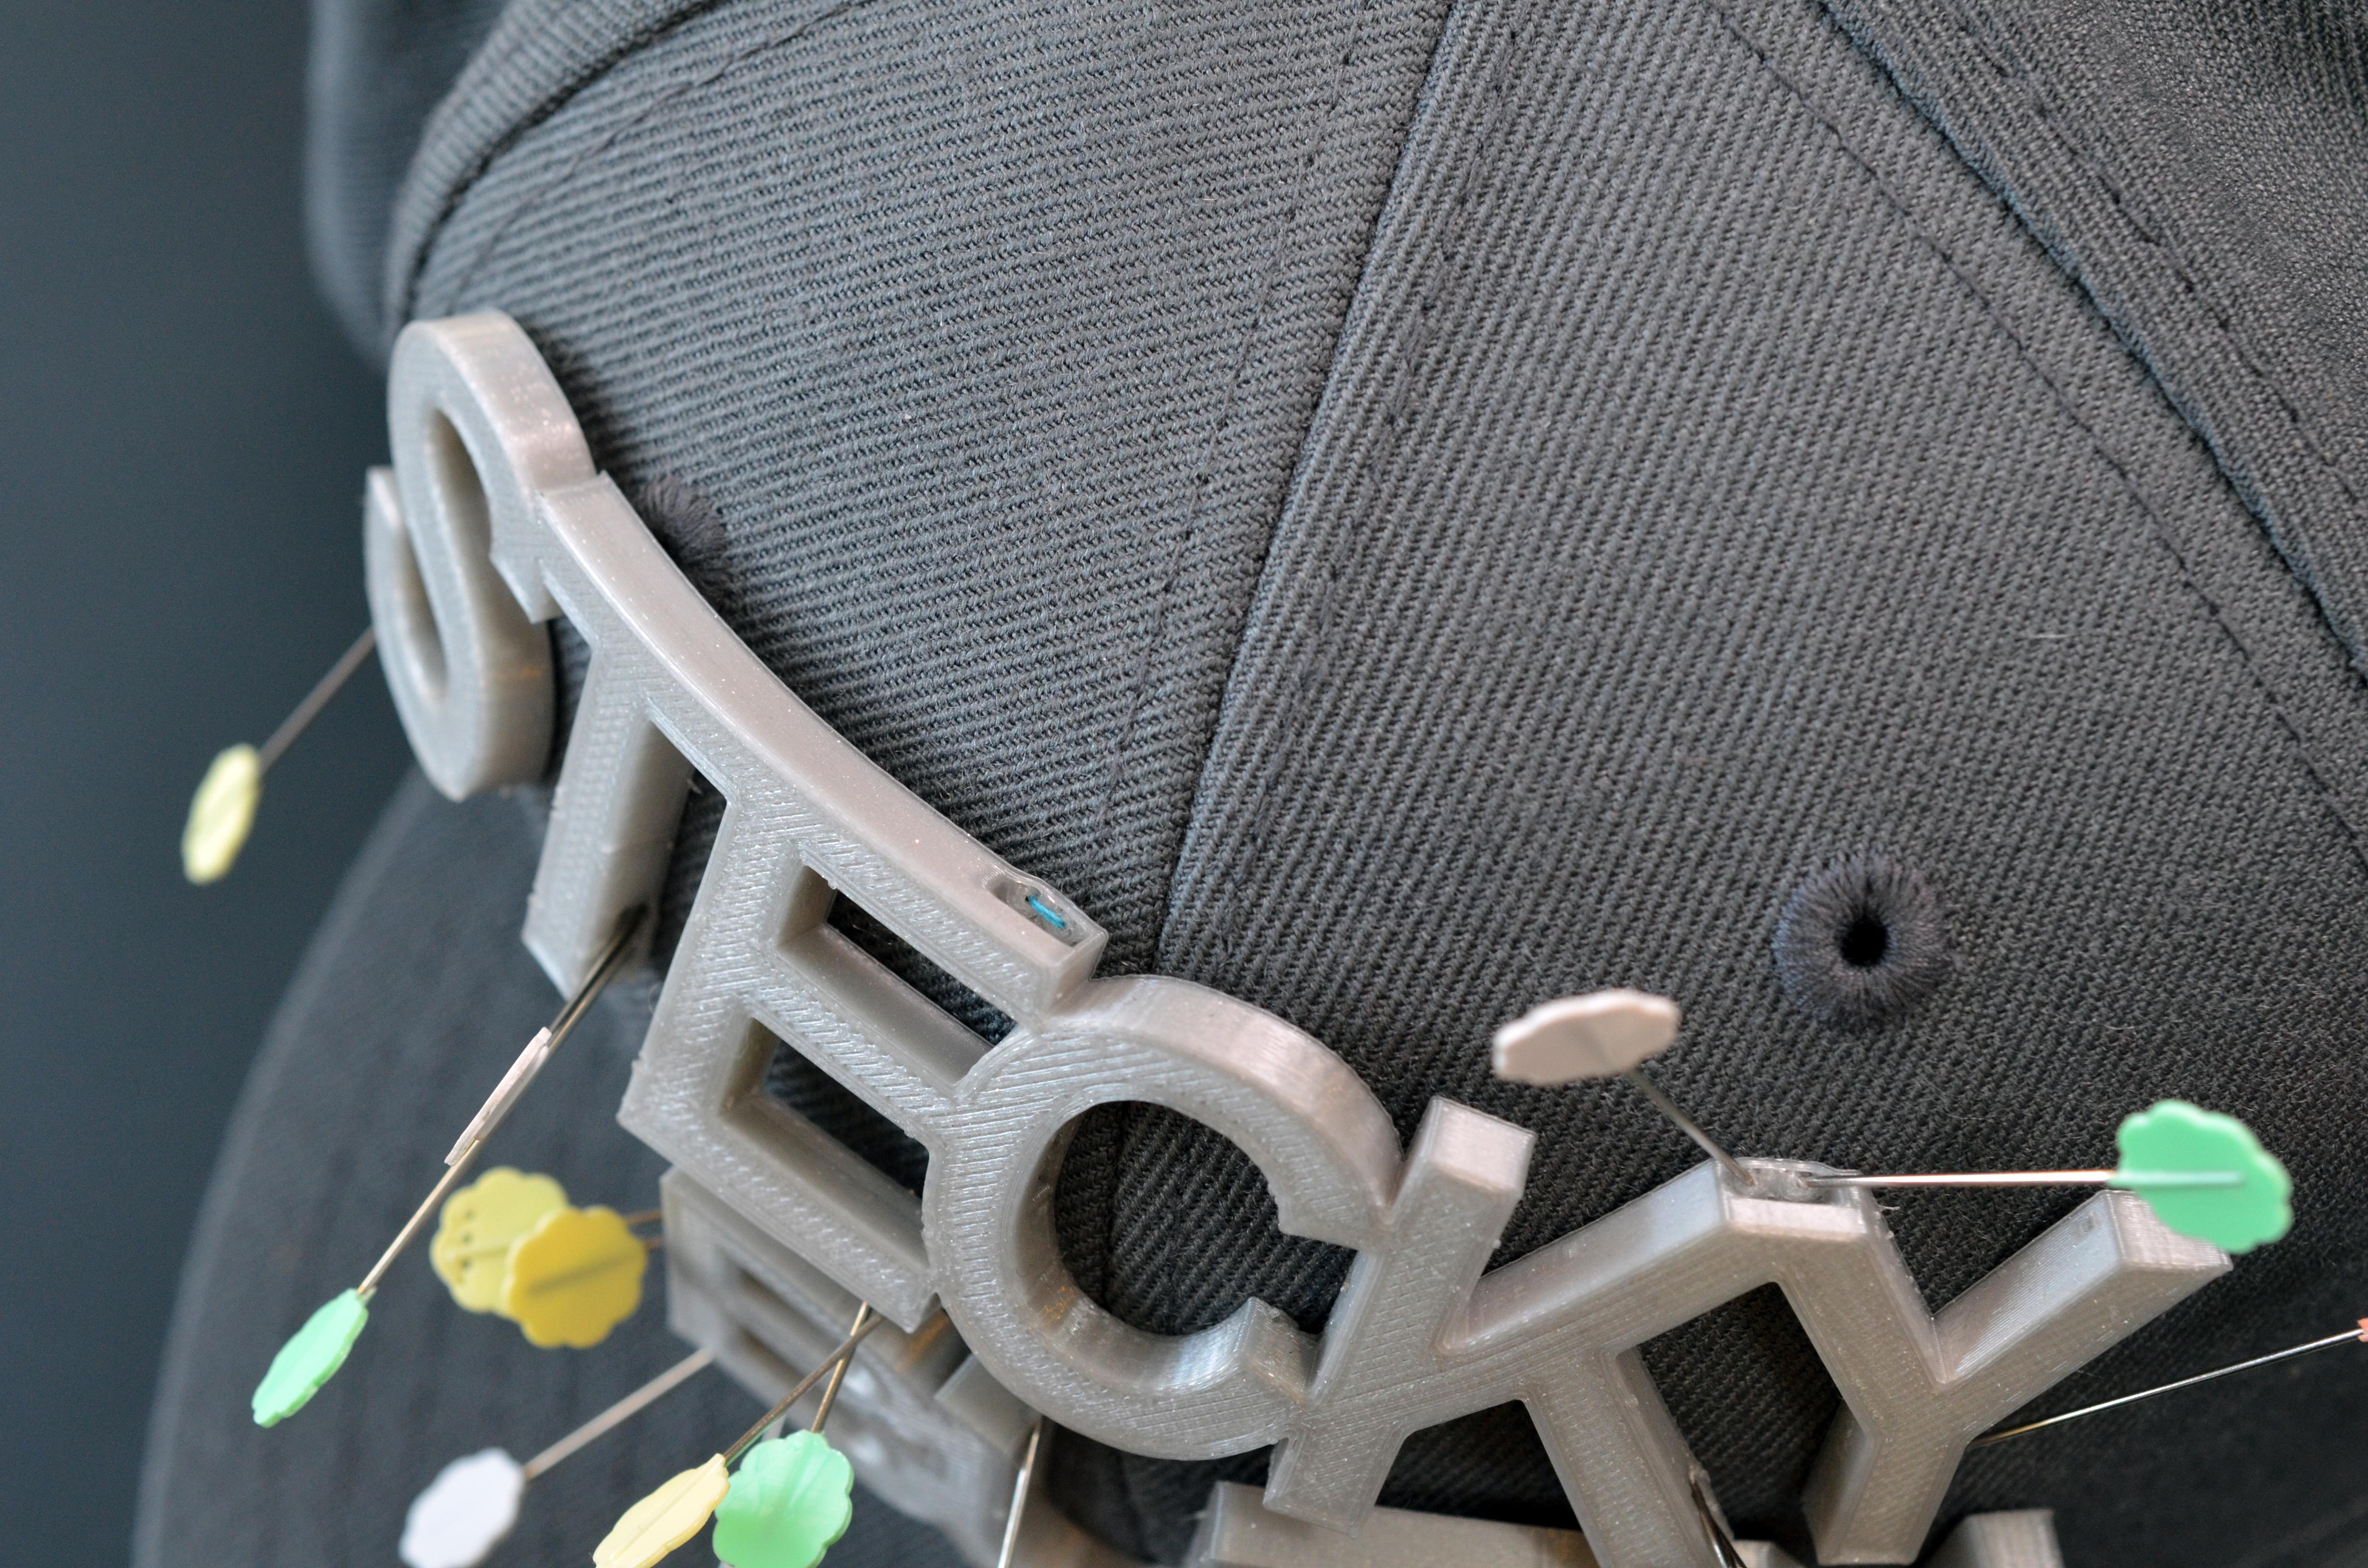 3d_printing_custom-hat-text-04.jpg